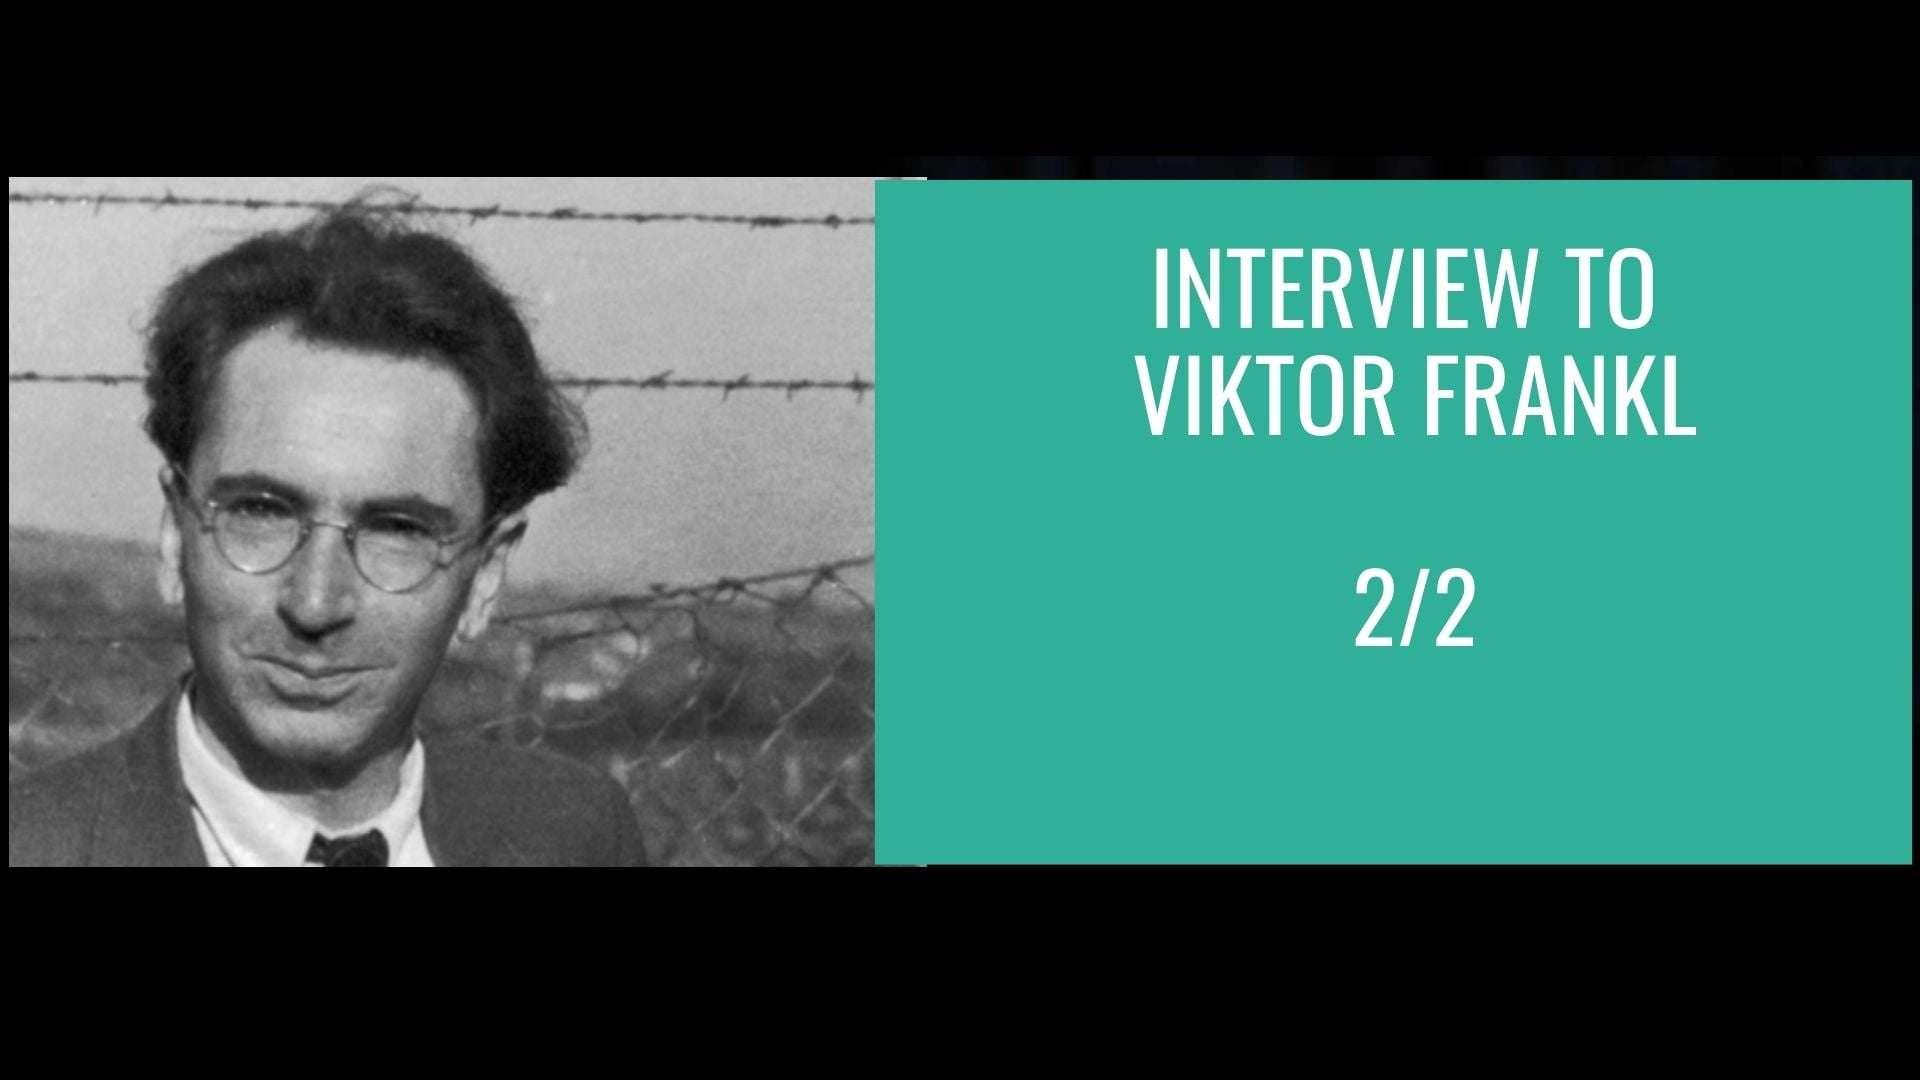 Interview to Viktor Frankl 2_2